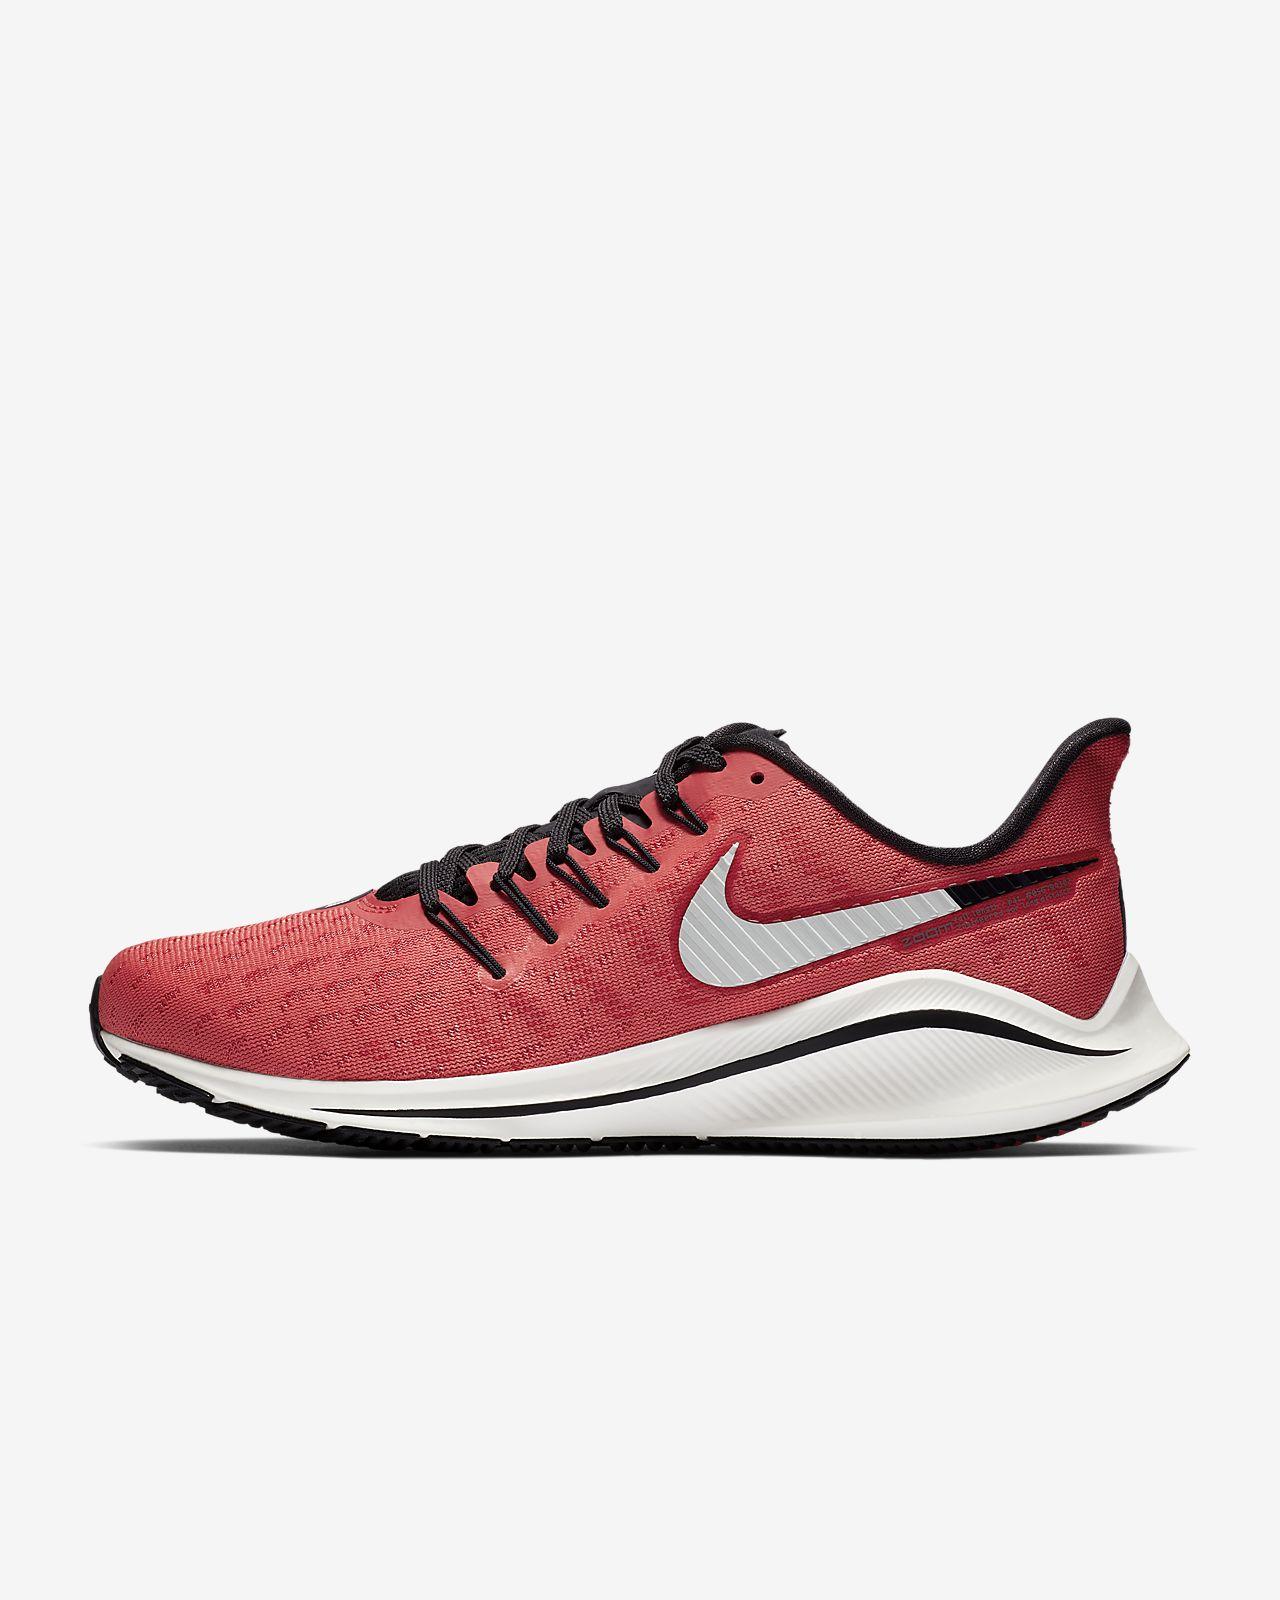 Damen Vomero Nike 14 Zoom Air Laufschuh tQdhrsC